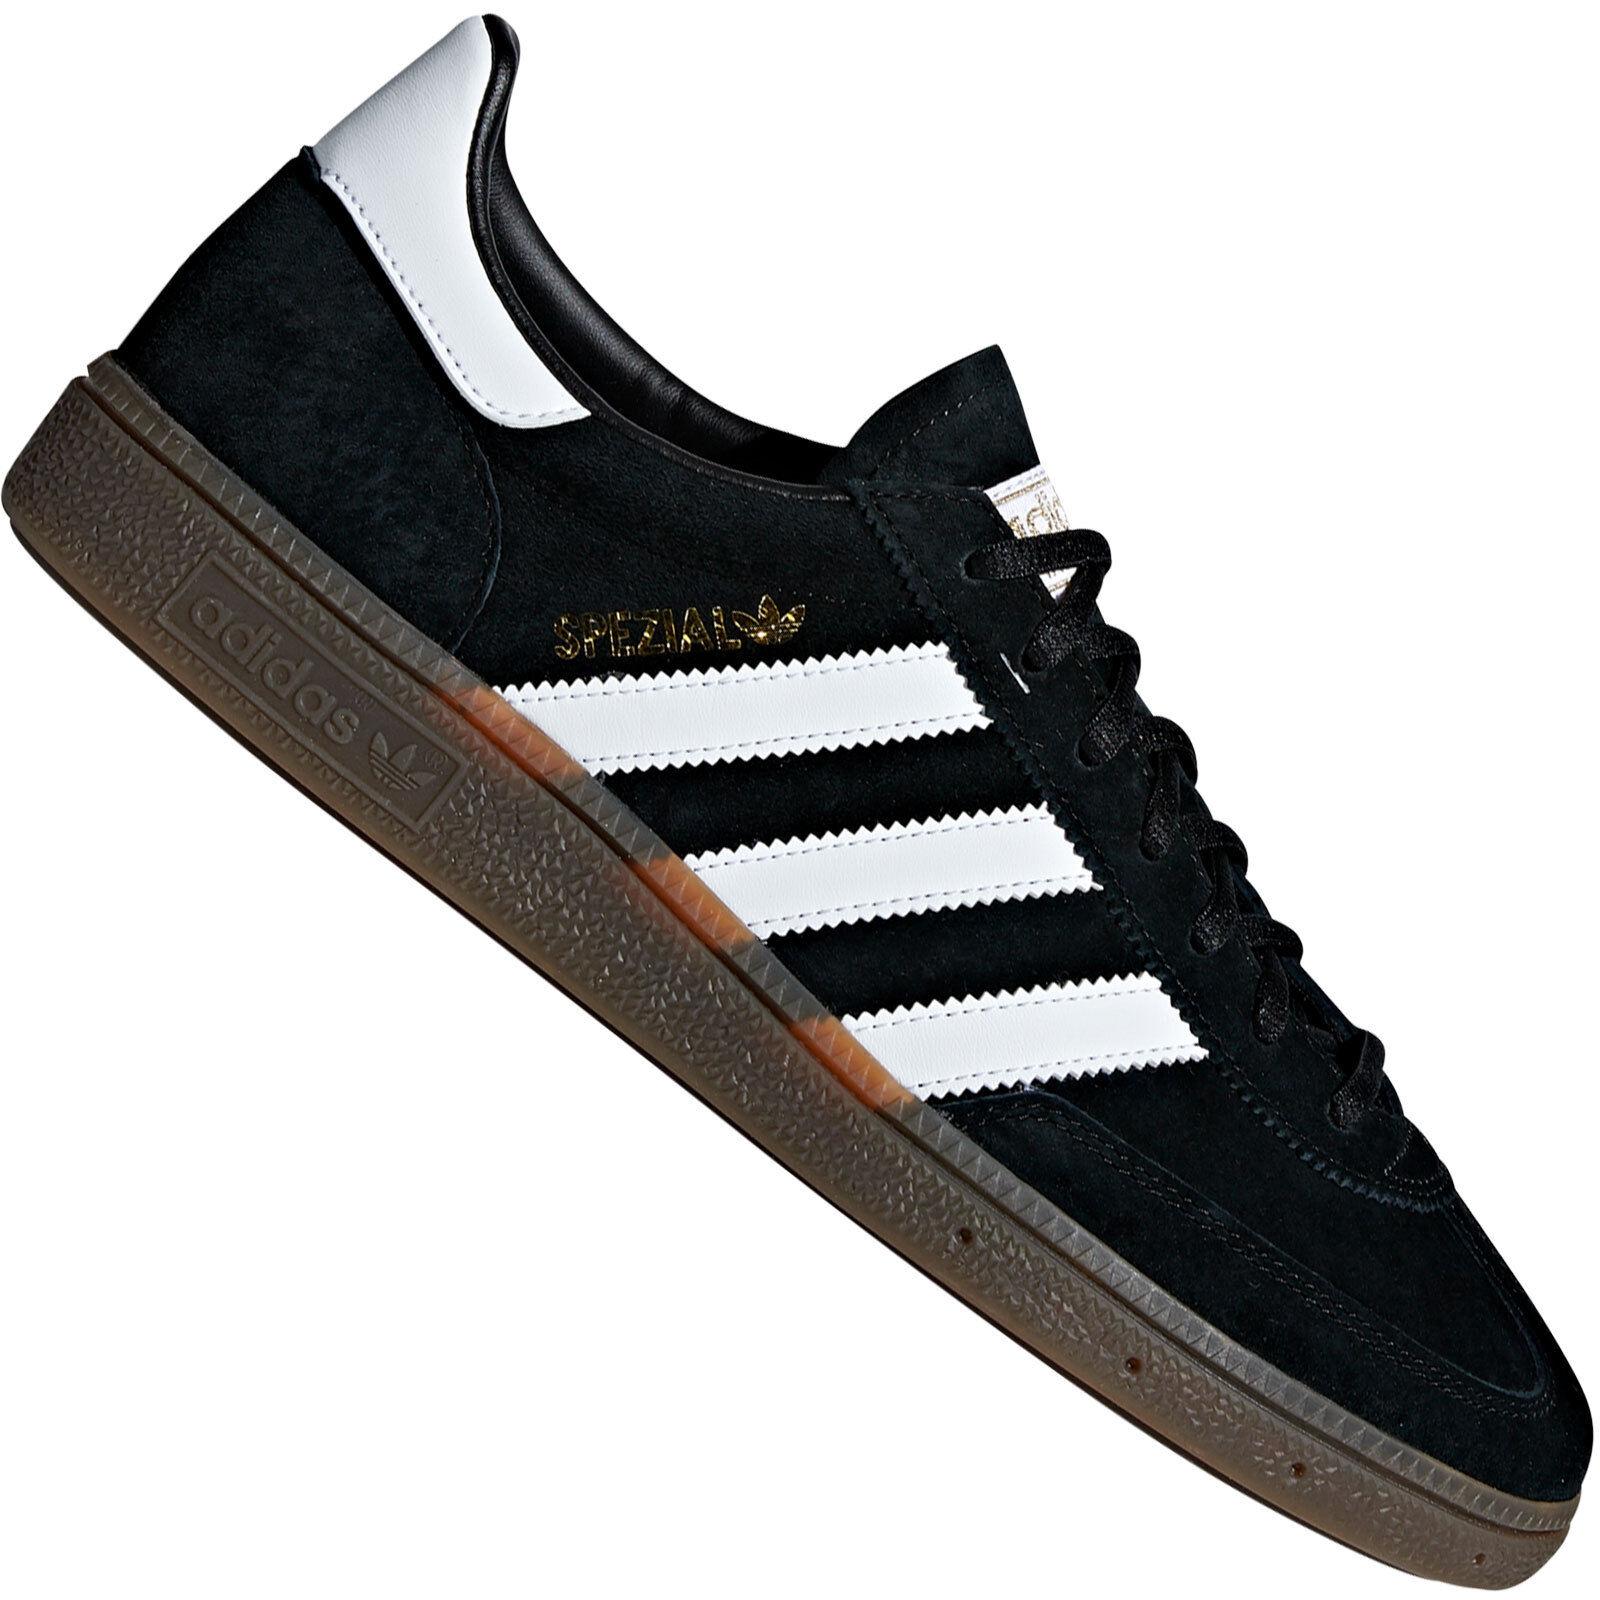 Adidas Originals Handball Spezial Herren Schuhe Turnschuhe Halbschuhe Turnschuhe Turnschuhe Turnschuhe d71984